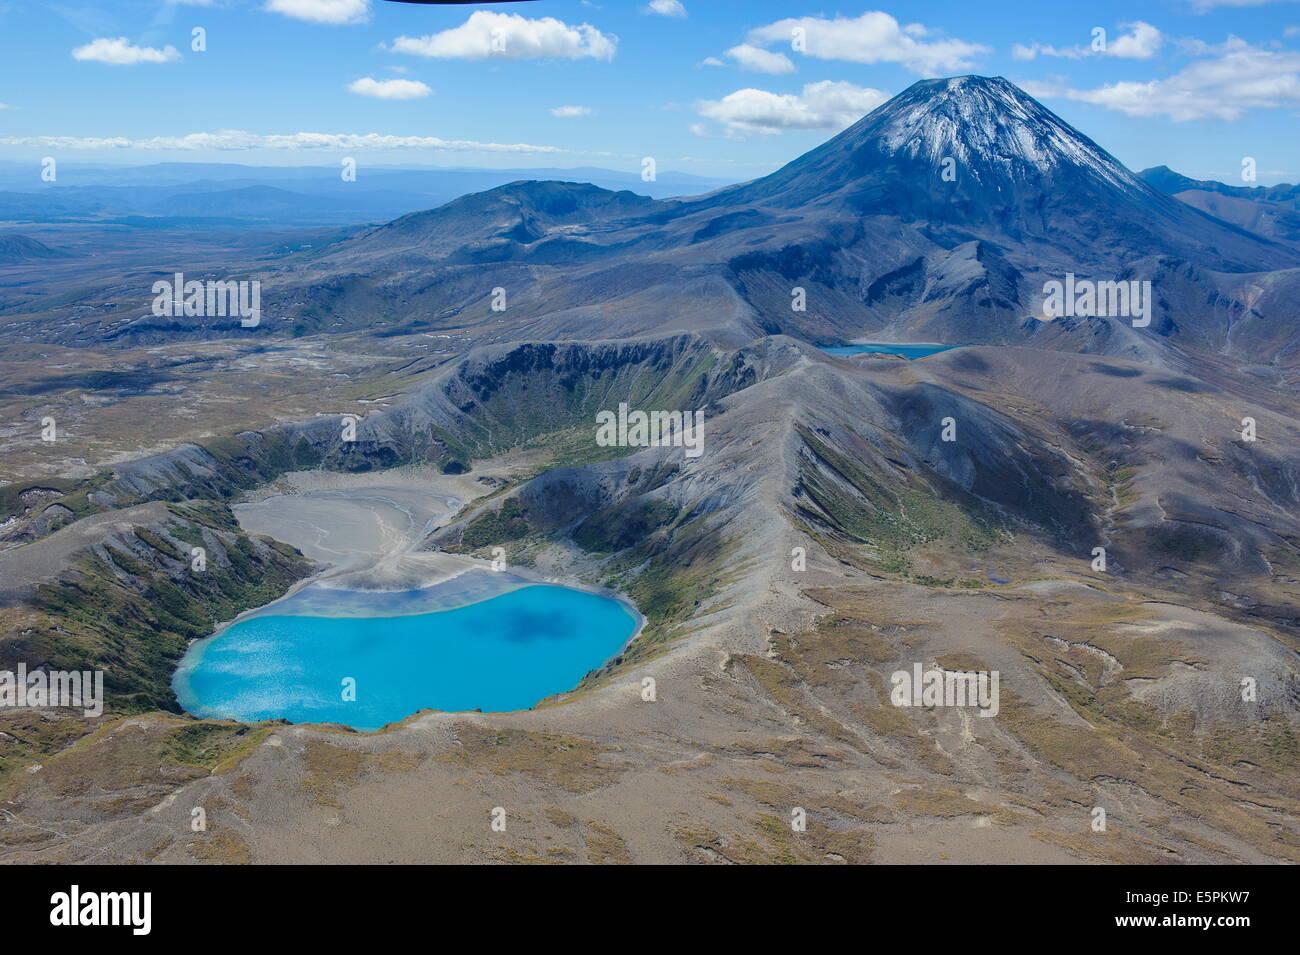 Aerial of the blue lake before Mount Ngauruhoe, Tongariro National Park, UNESCO Site, North Island, New Zealand - Stock Image